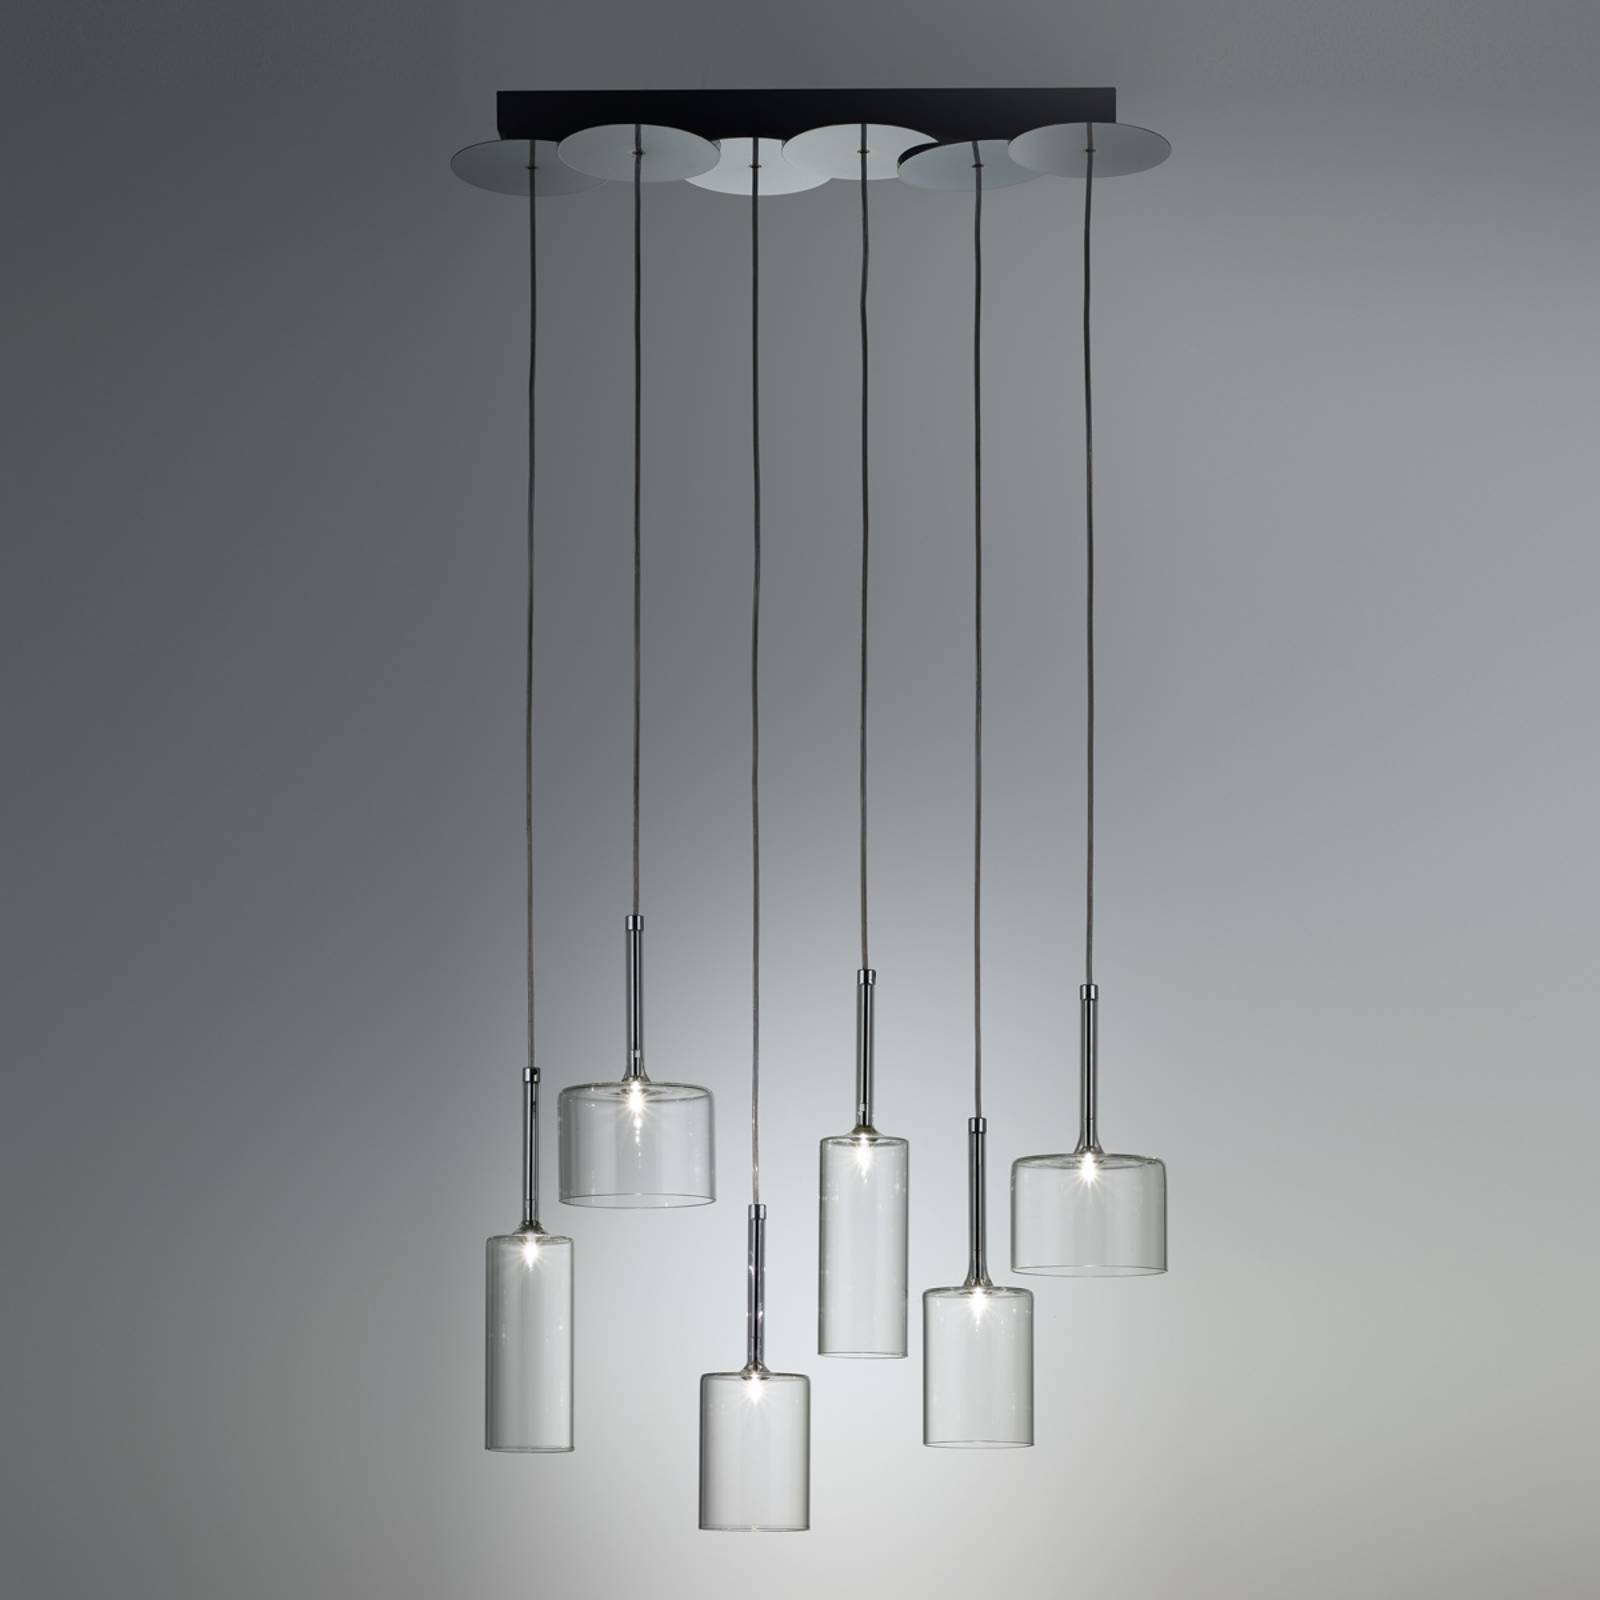 Glazen hanglamp Spillray met zes lampjes